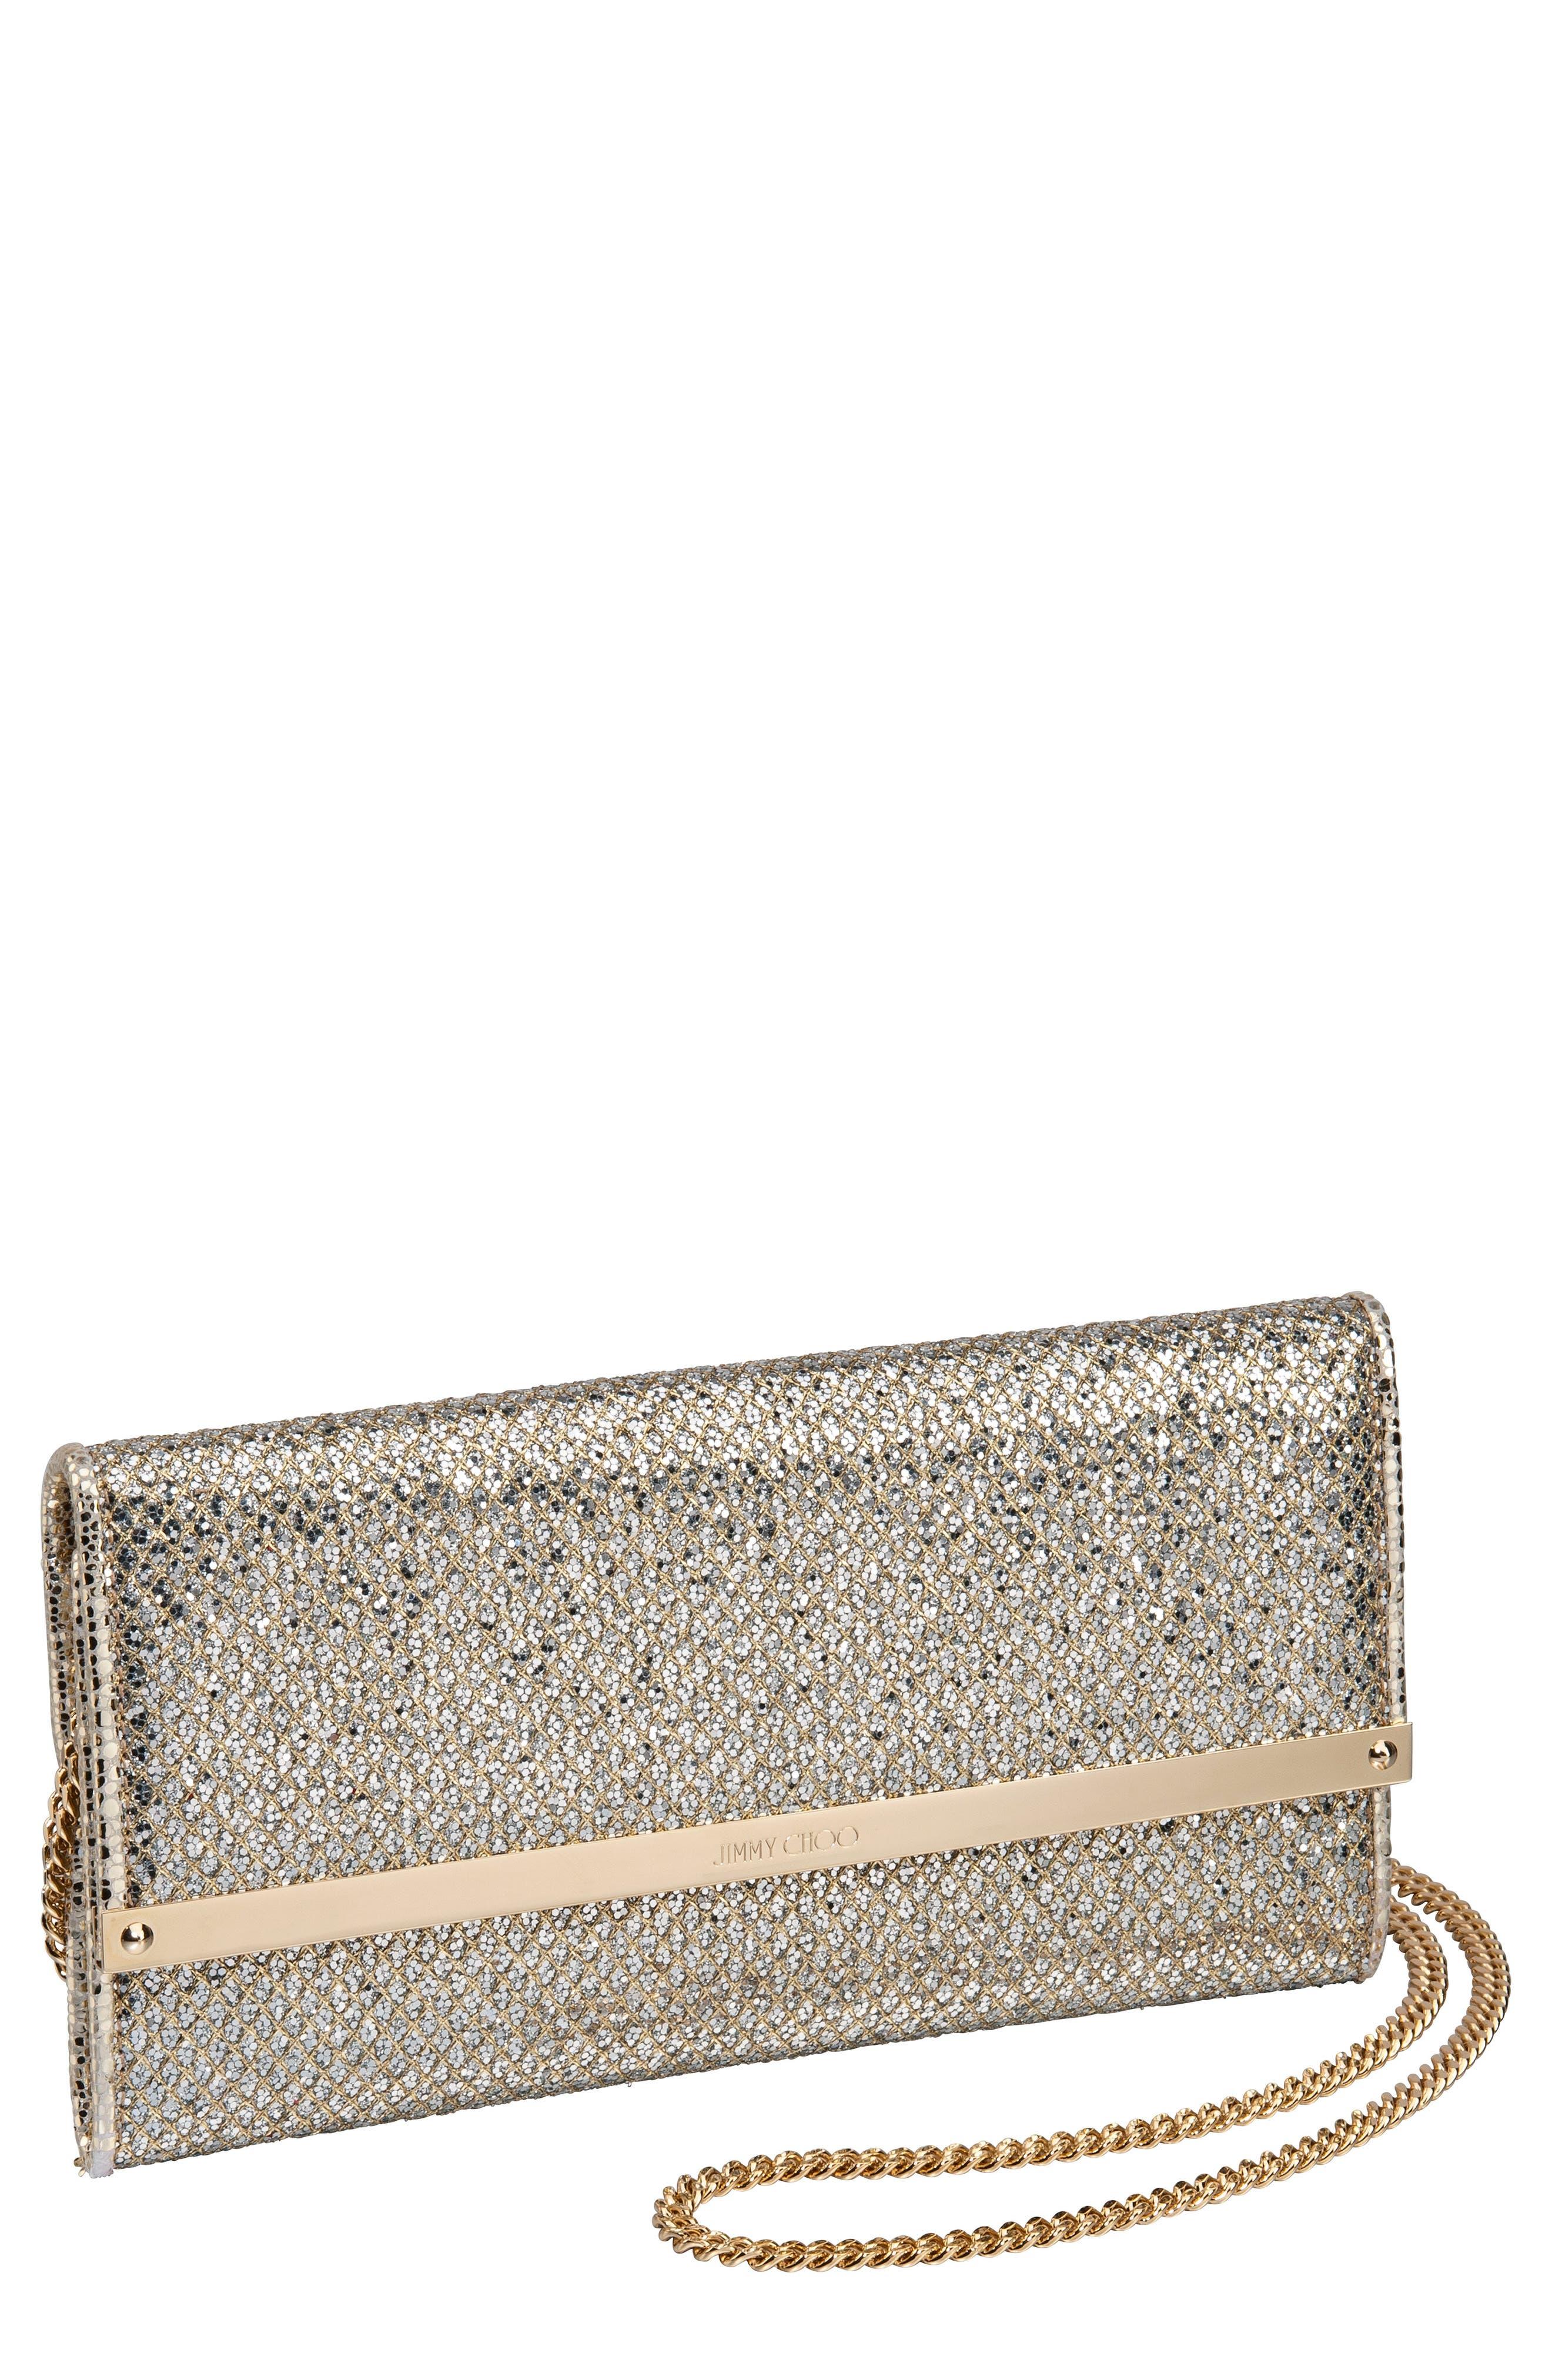 Main Image - Jimmy Choo Milla Glitter Wallet on a Chain